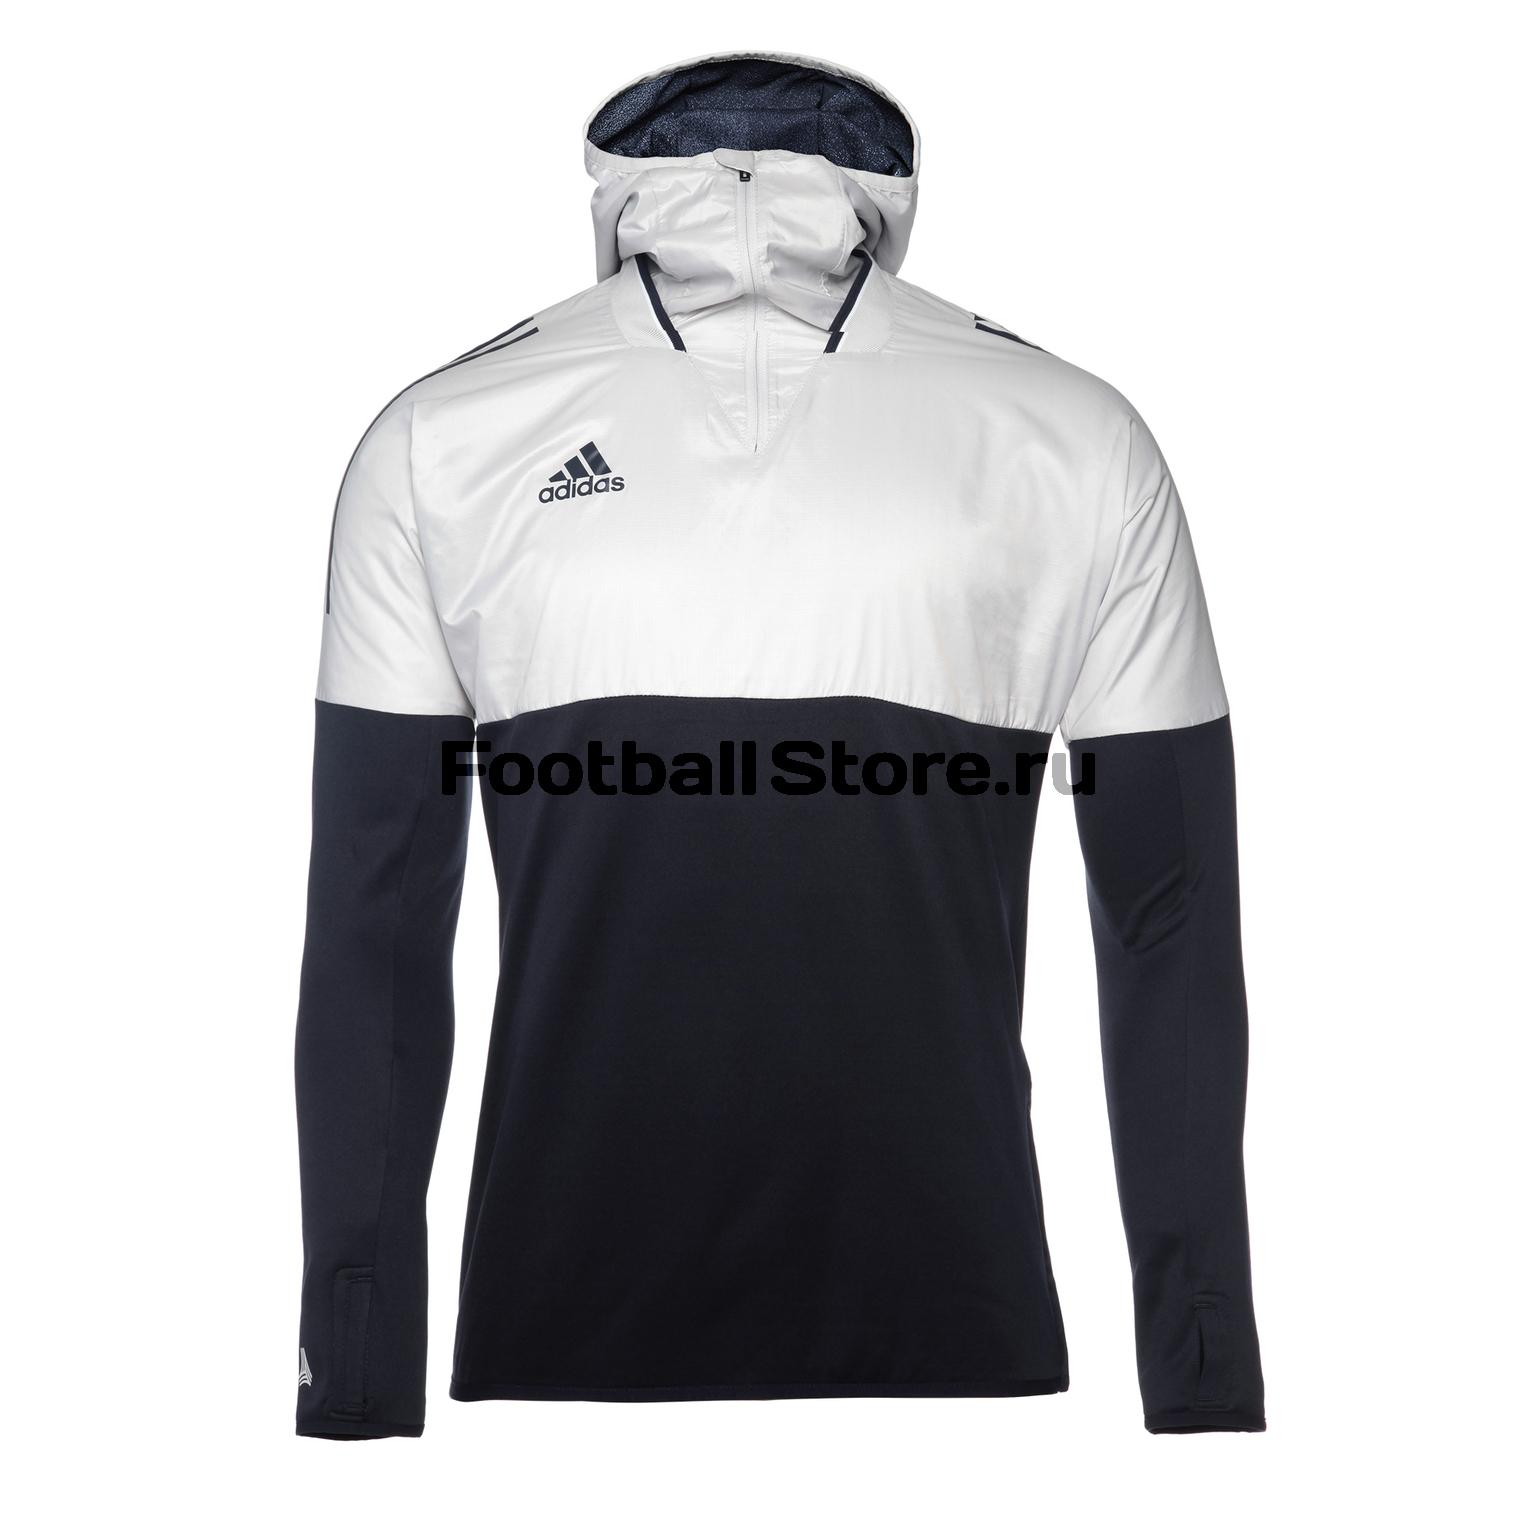 все цены на Куртки/Пуховики Adidas Ветровка Adidas TanF HYB Top CE9574 онлайн